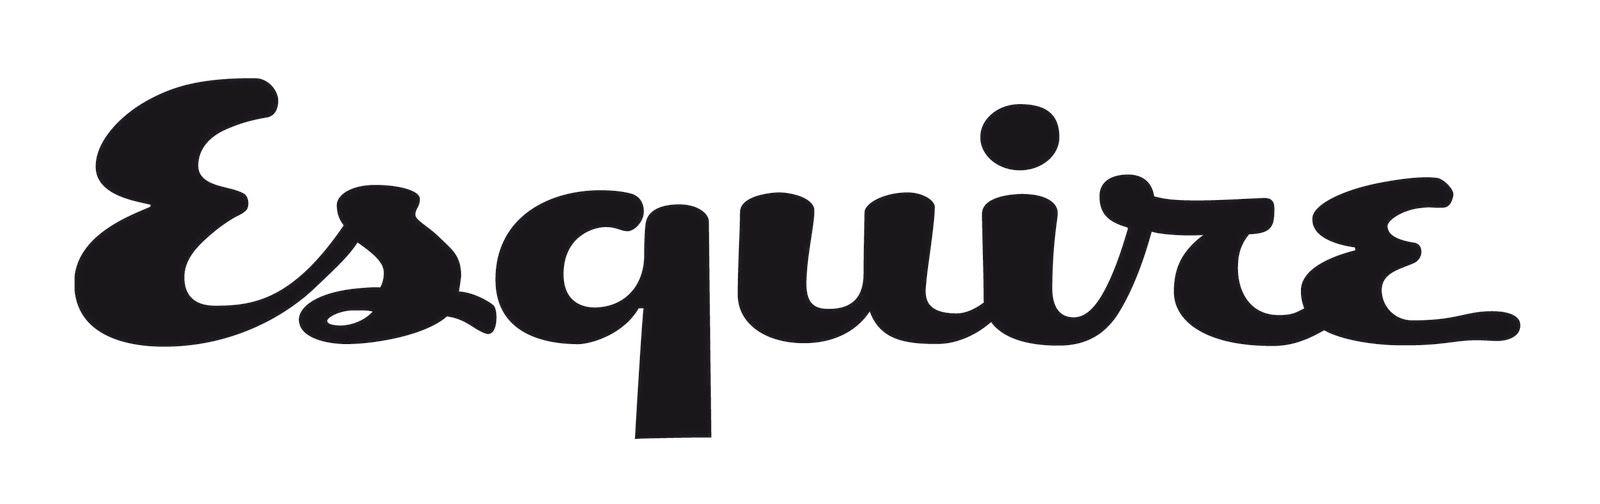 esquire logo - Bing Afbeeldingen (With images) | Esquire, Script ...